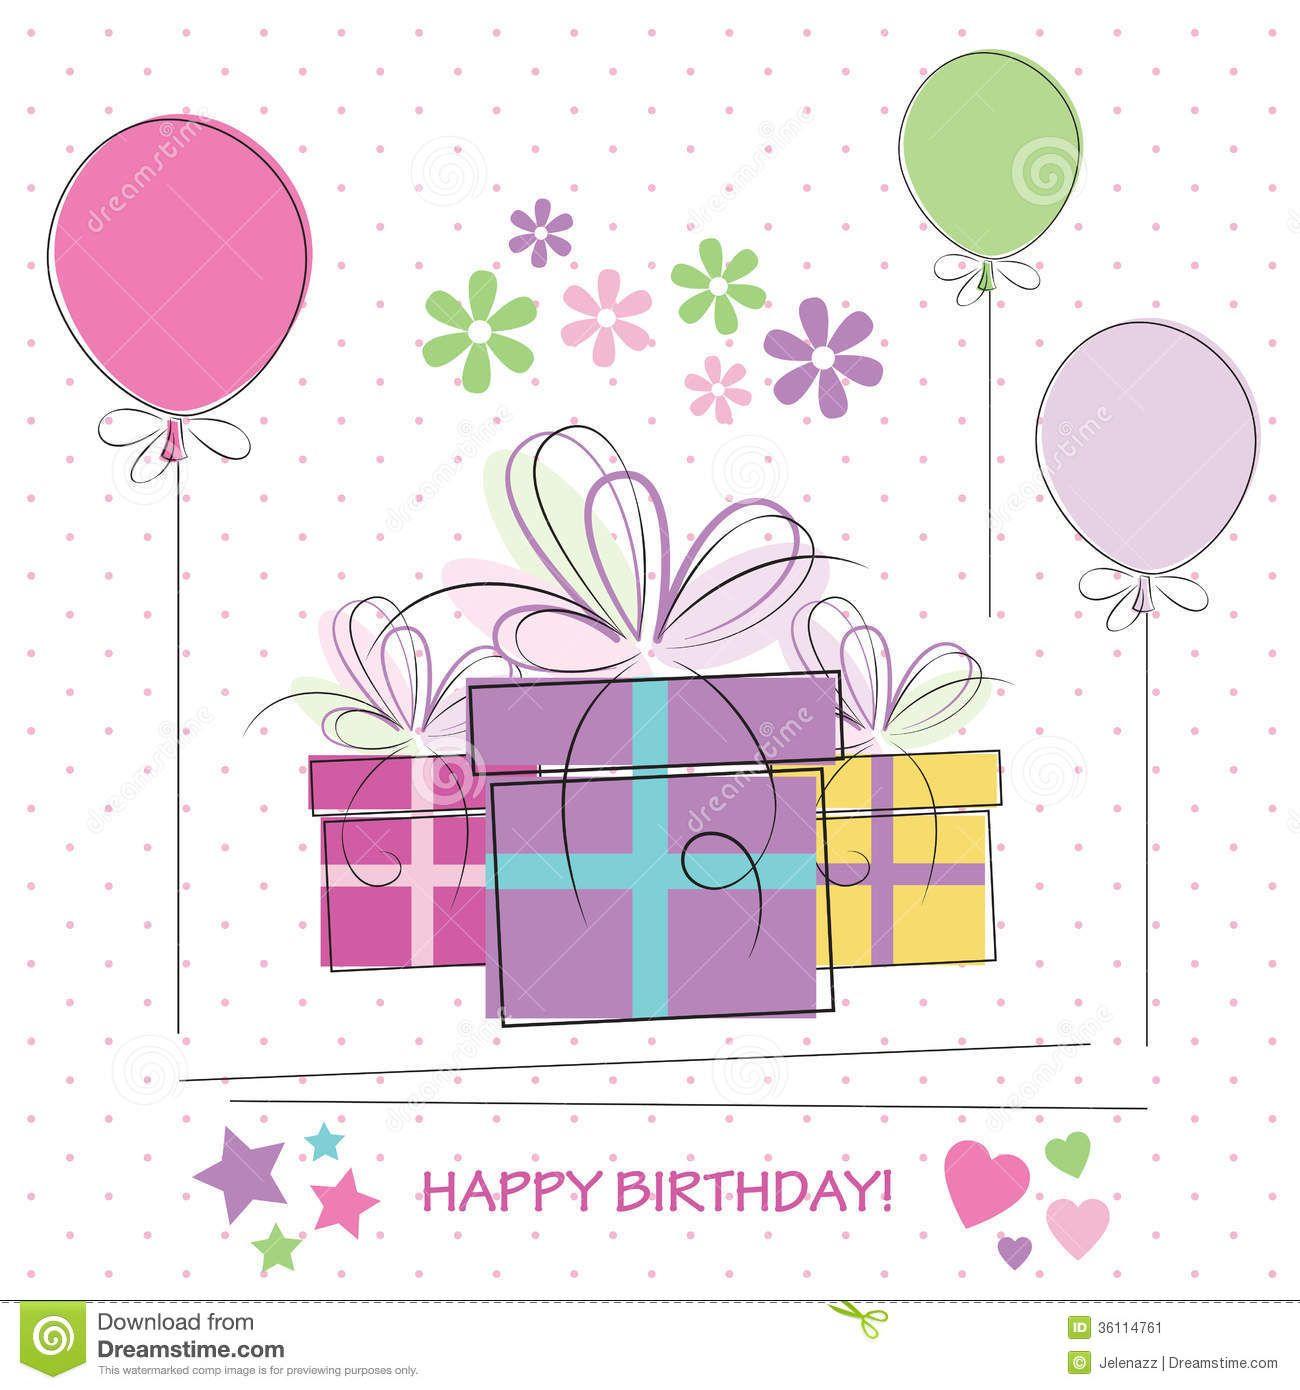 Alfa img Showing Happy Birthday White Background Tumblr – Birthday Cards Backgrounds